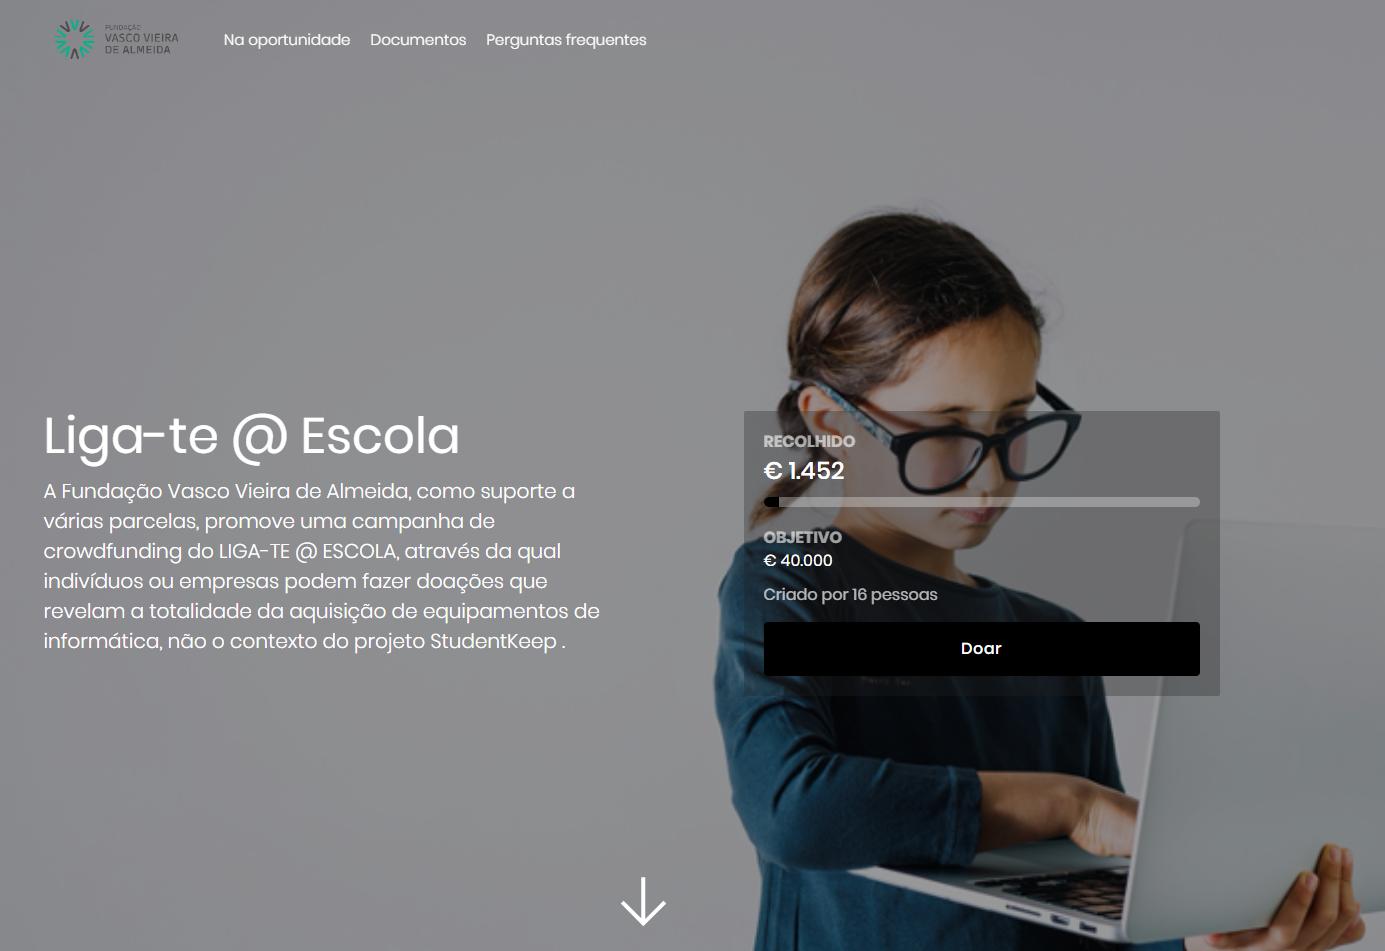 LIGA-TE@ESCOLA